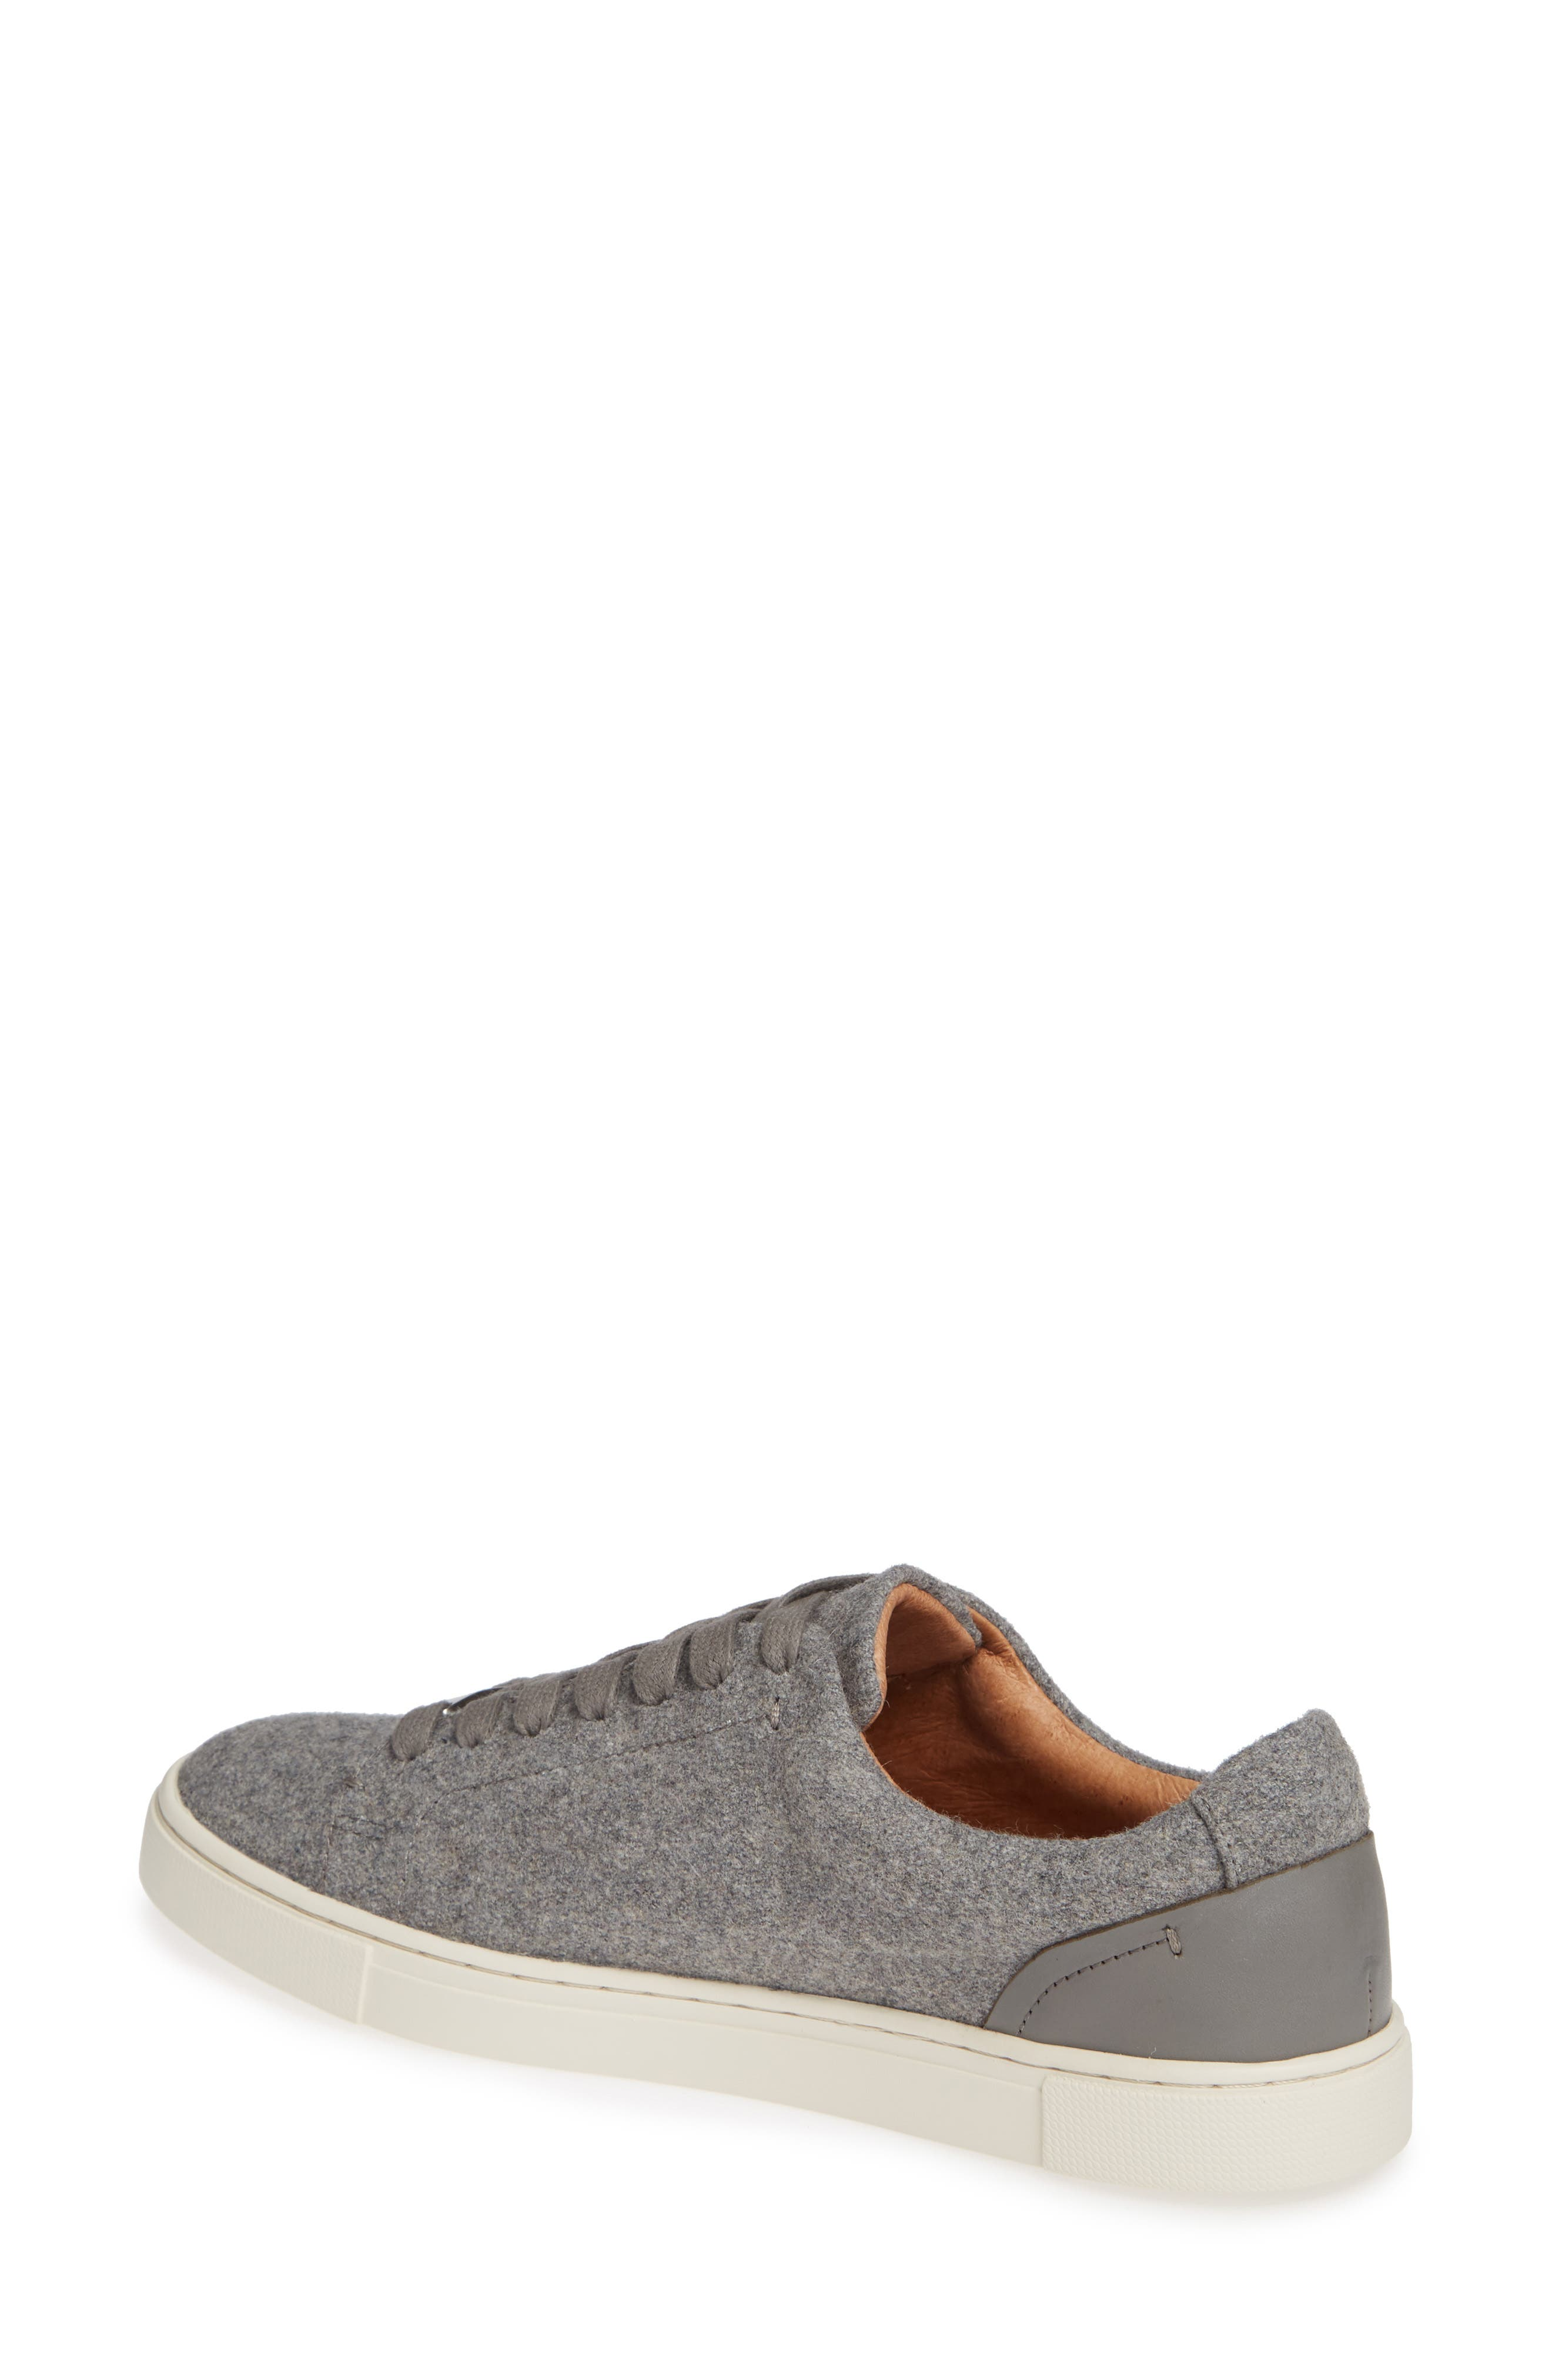 Ivy Sneaker,                             Alternate thumbnail 2, color,                             GREY WOOL FABRIC